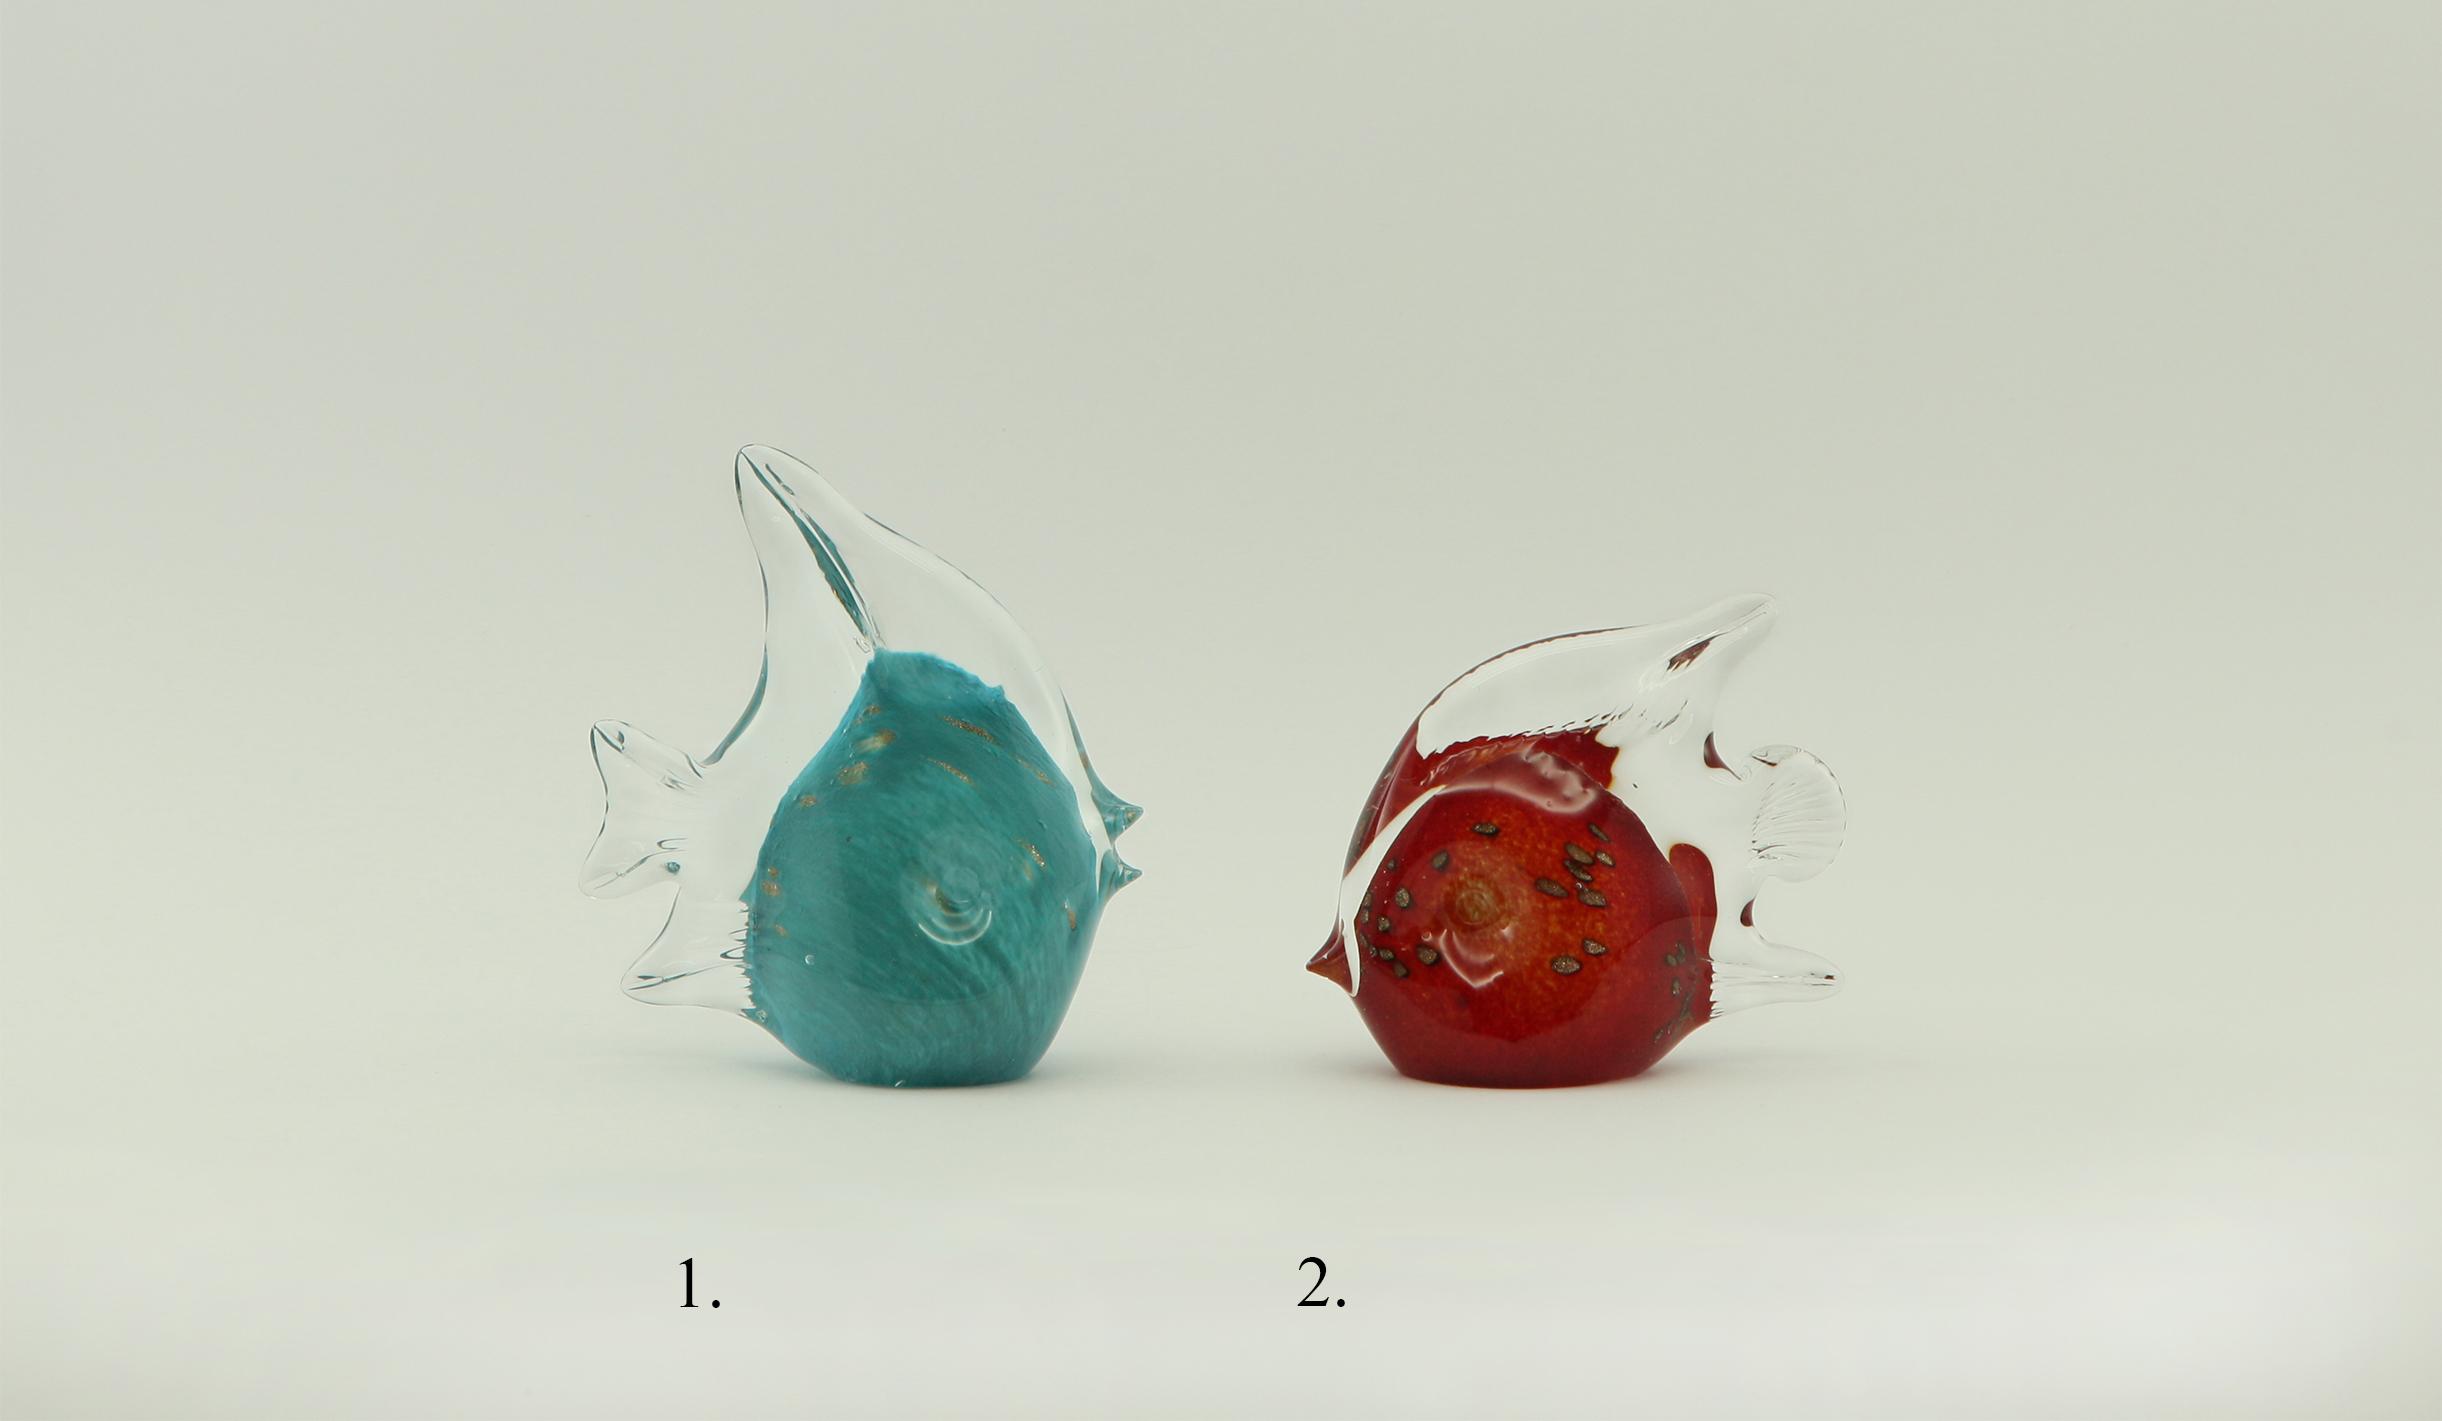 Рыбки 1D-14(1)/1D-14(2)